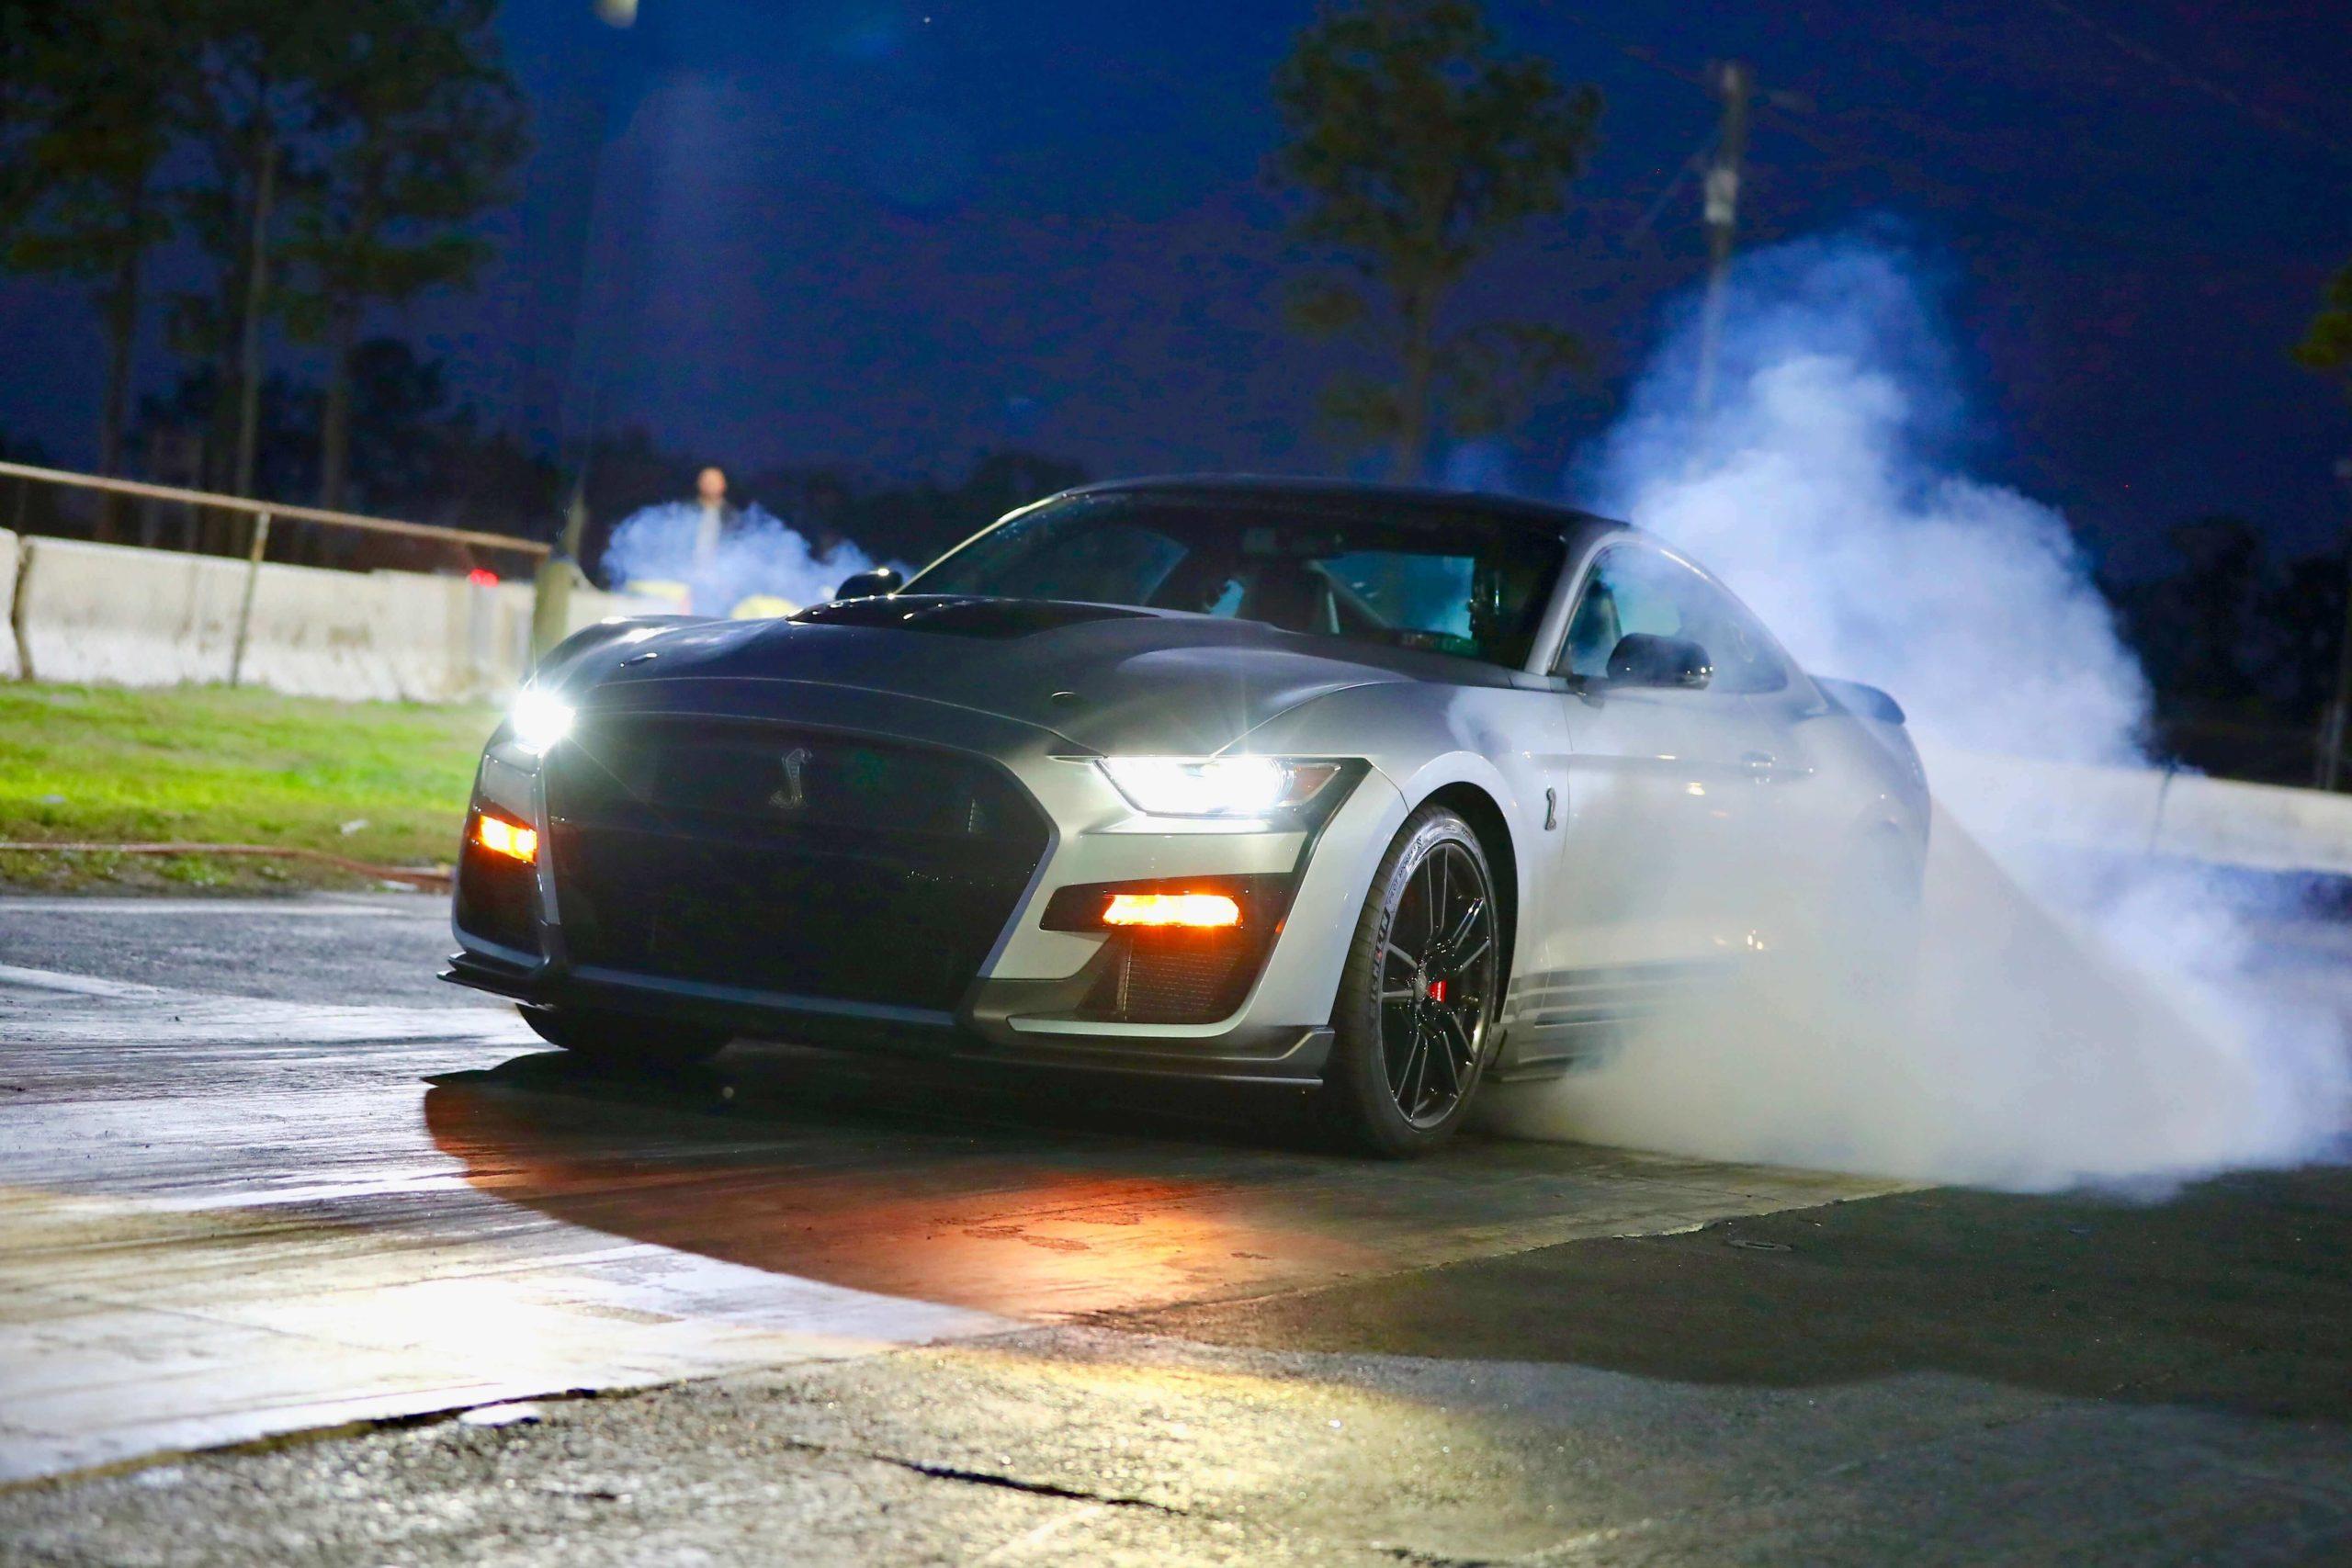 Evolution Performance sets 2020 GT500 1/4 mile record!